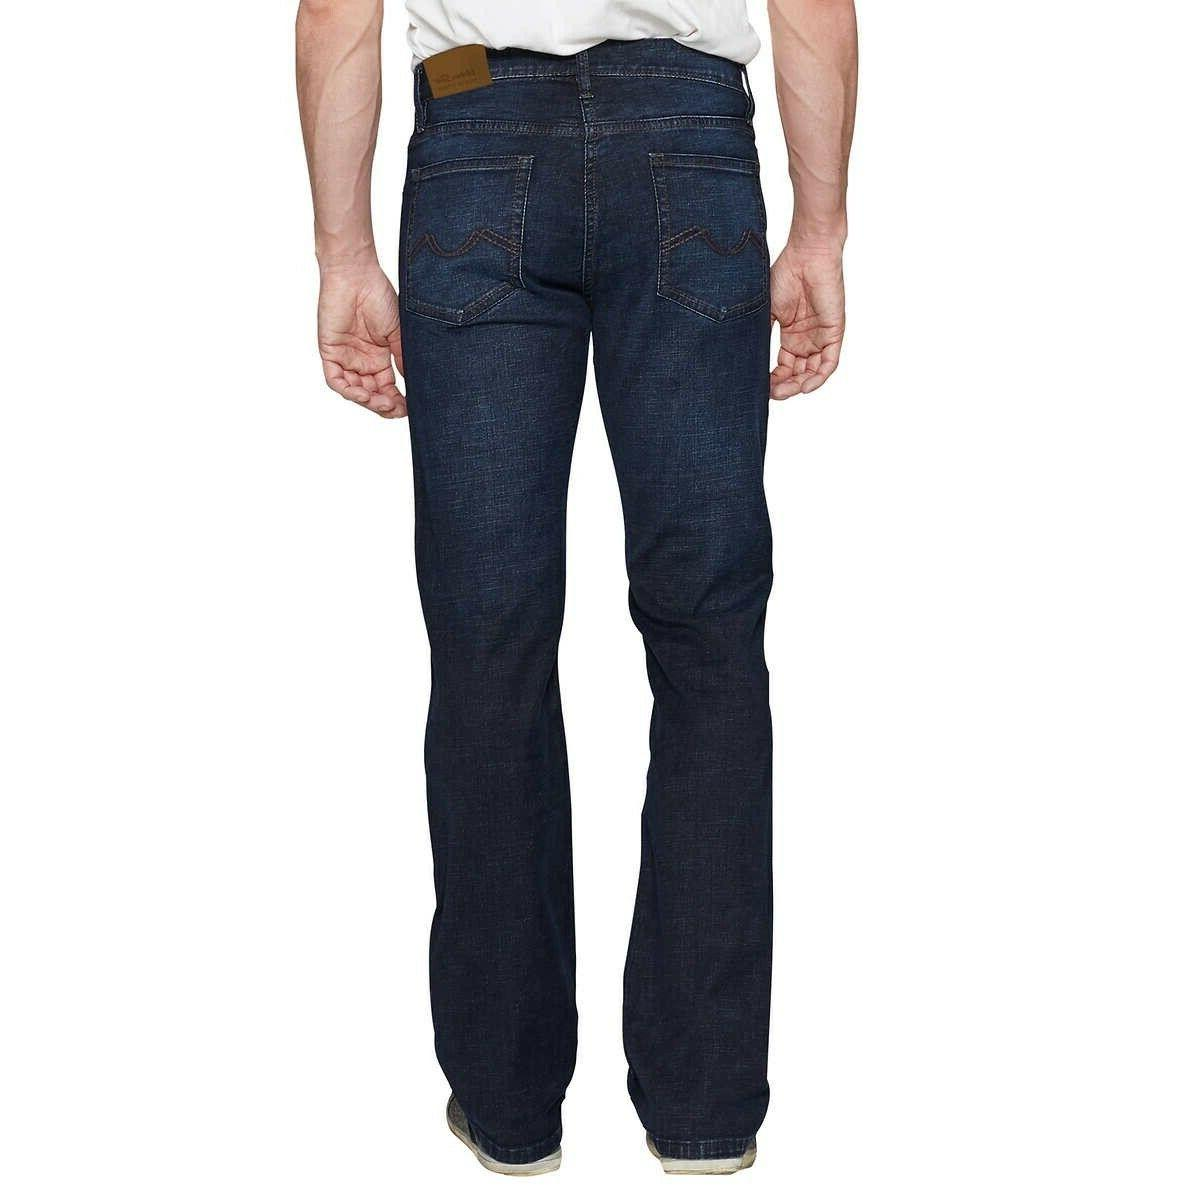 Urban Star Mens Wash Denim Pocket Fit Size